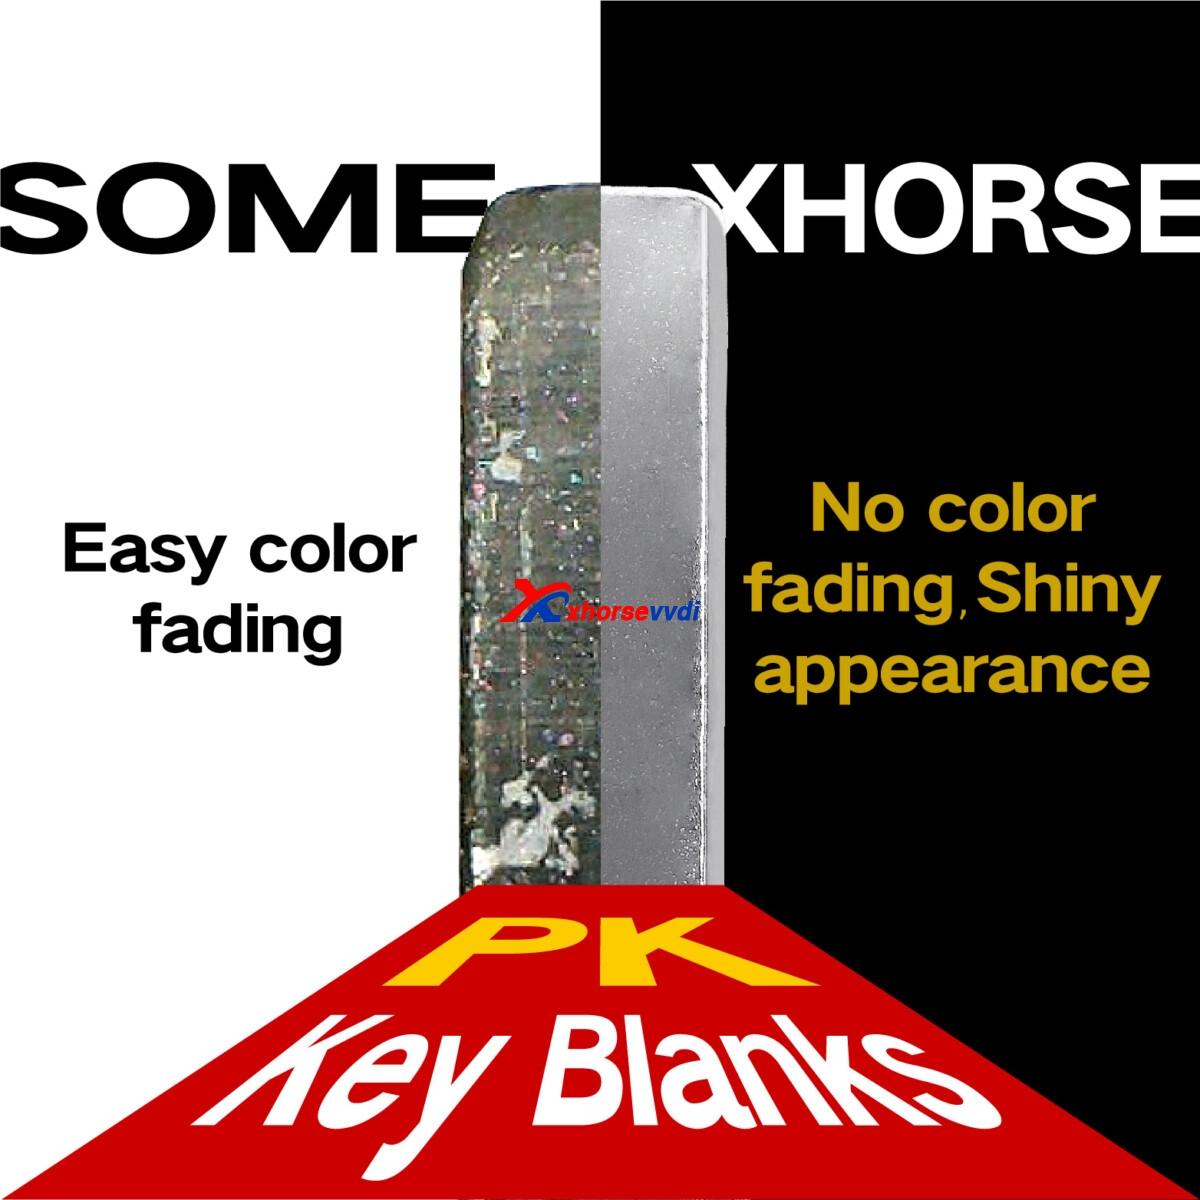 xhorse-universal-key-blank-04